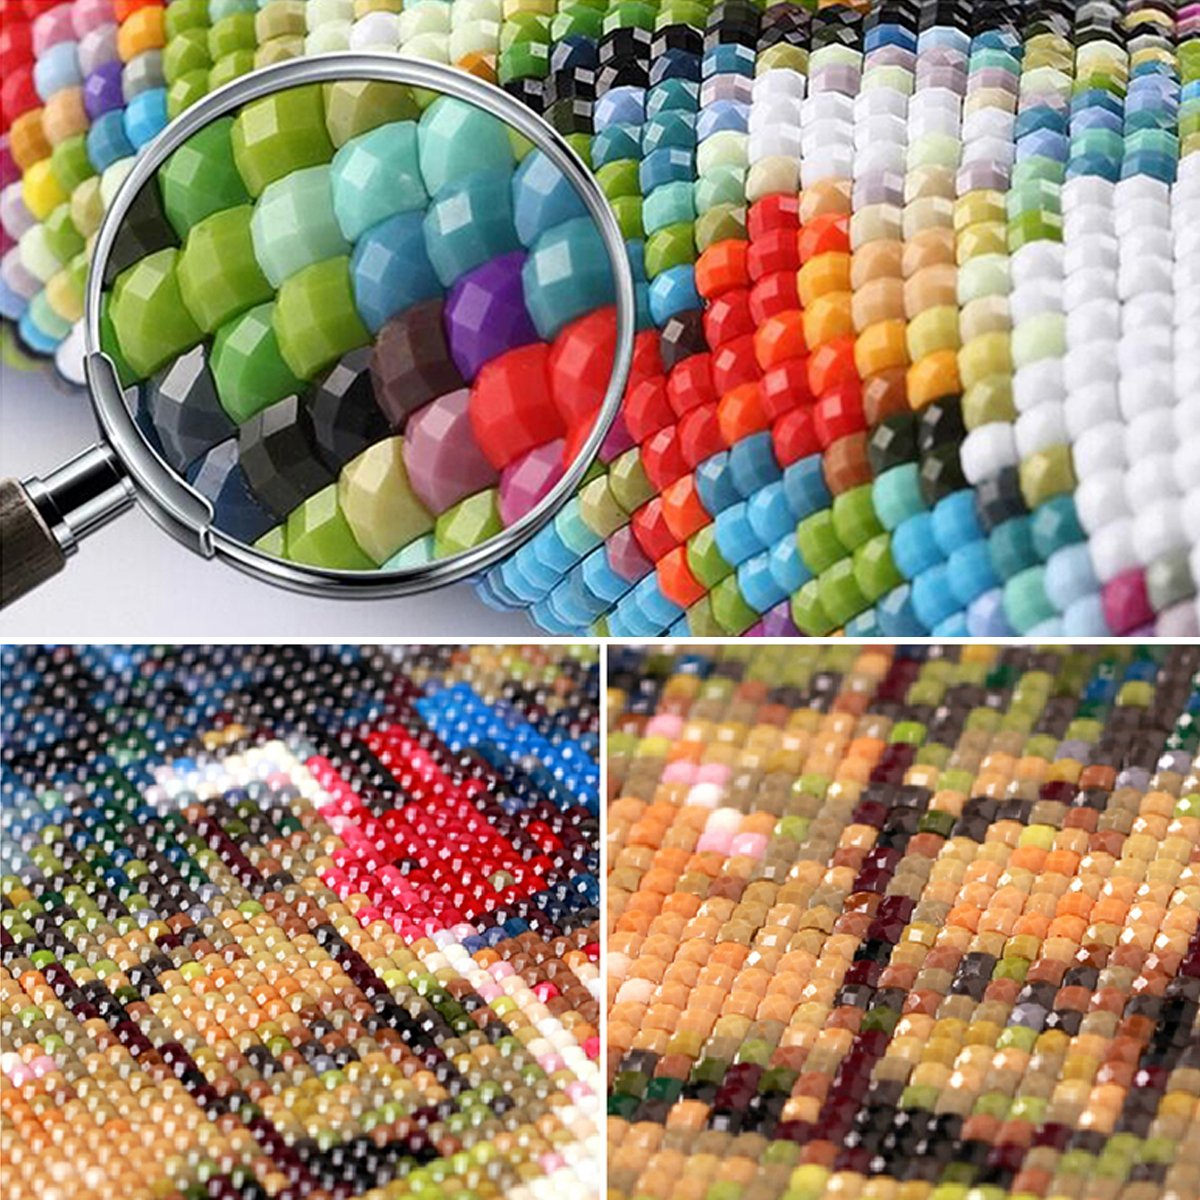 5D DIY Diamond Painting Kits Full Drill for Adults Crystal Rhinestone Embroidery Cross Stitch Arts Craft Canvas Wall Decor Moon Cat